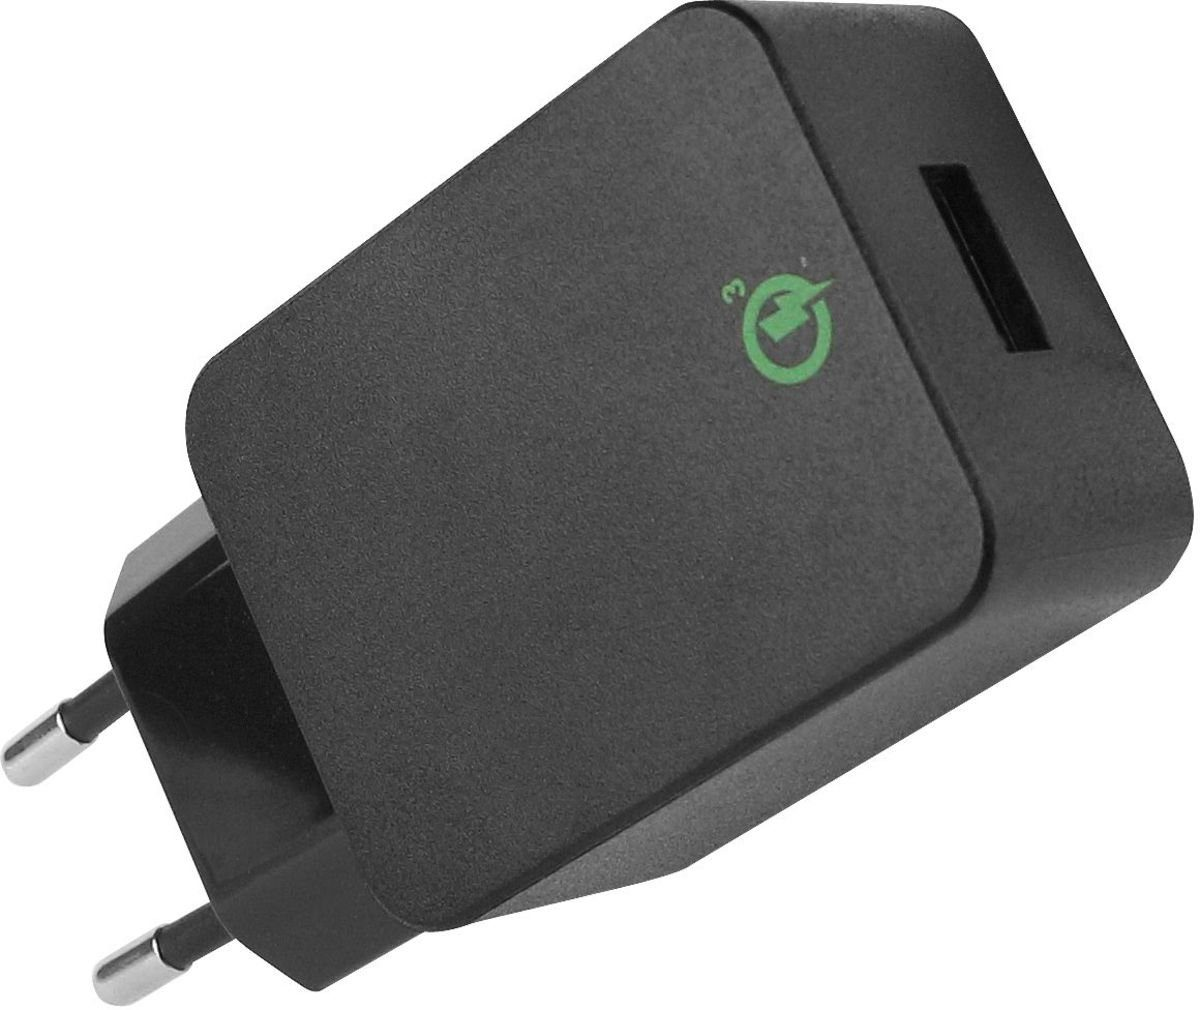 Fontastic Zubehör »Netzteil USB Compact Qualcom 3.0 3A«